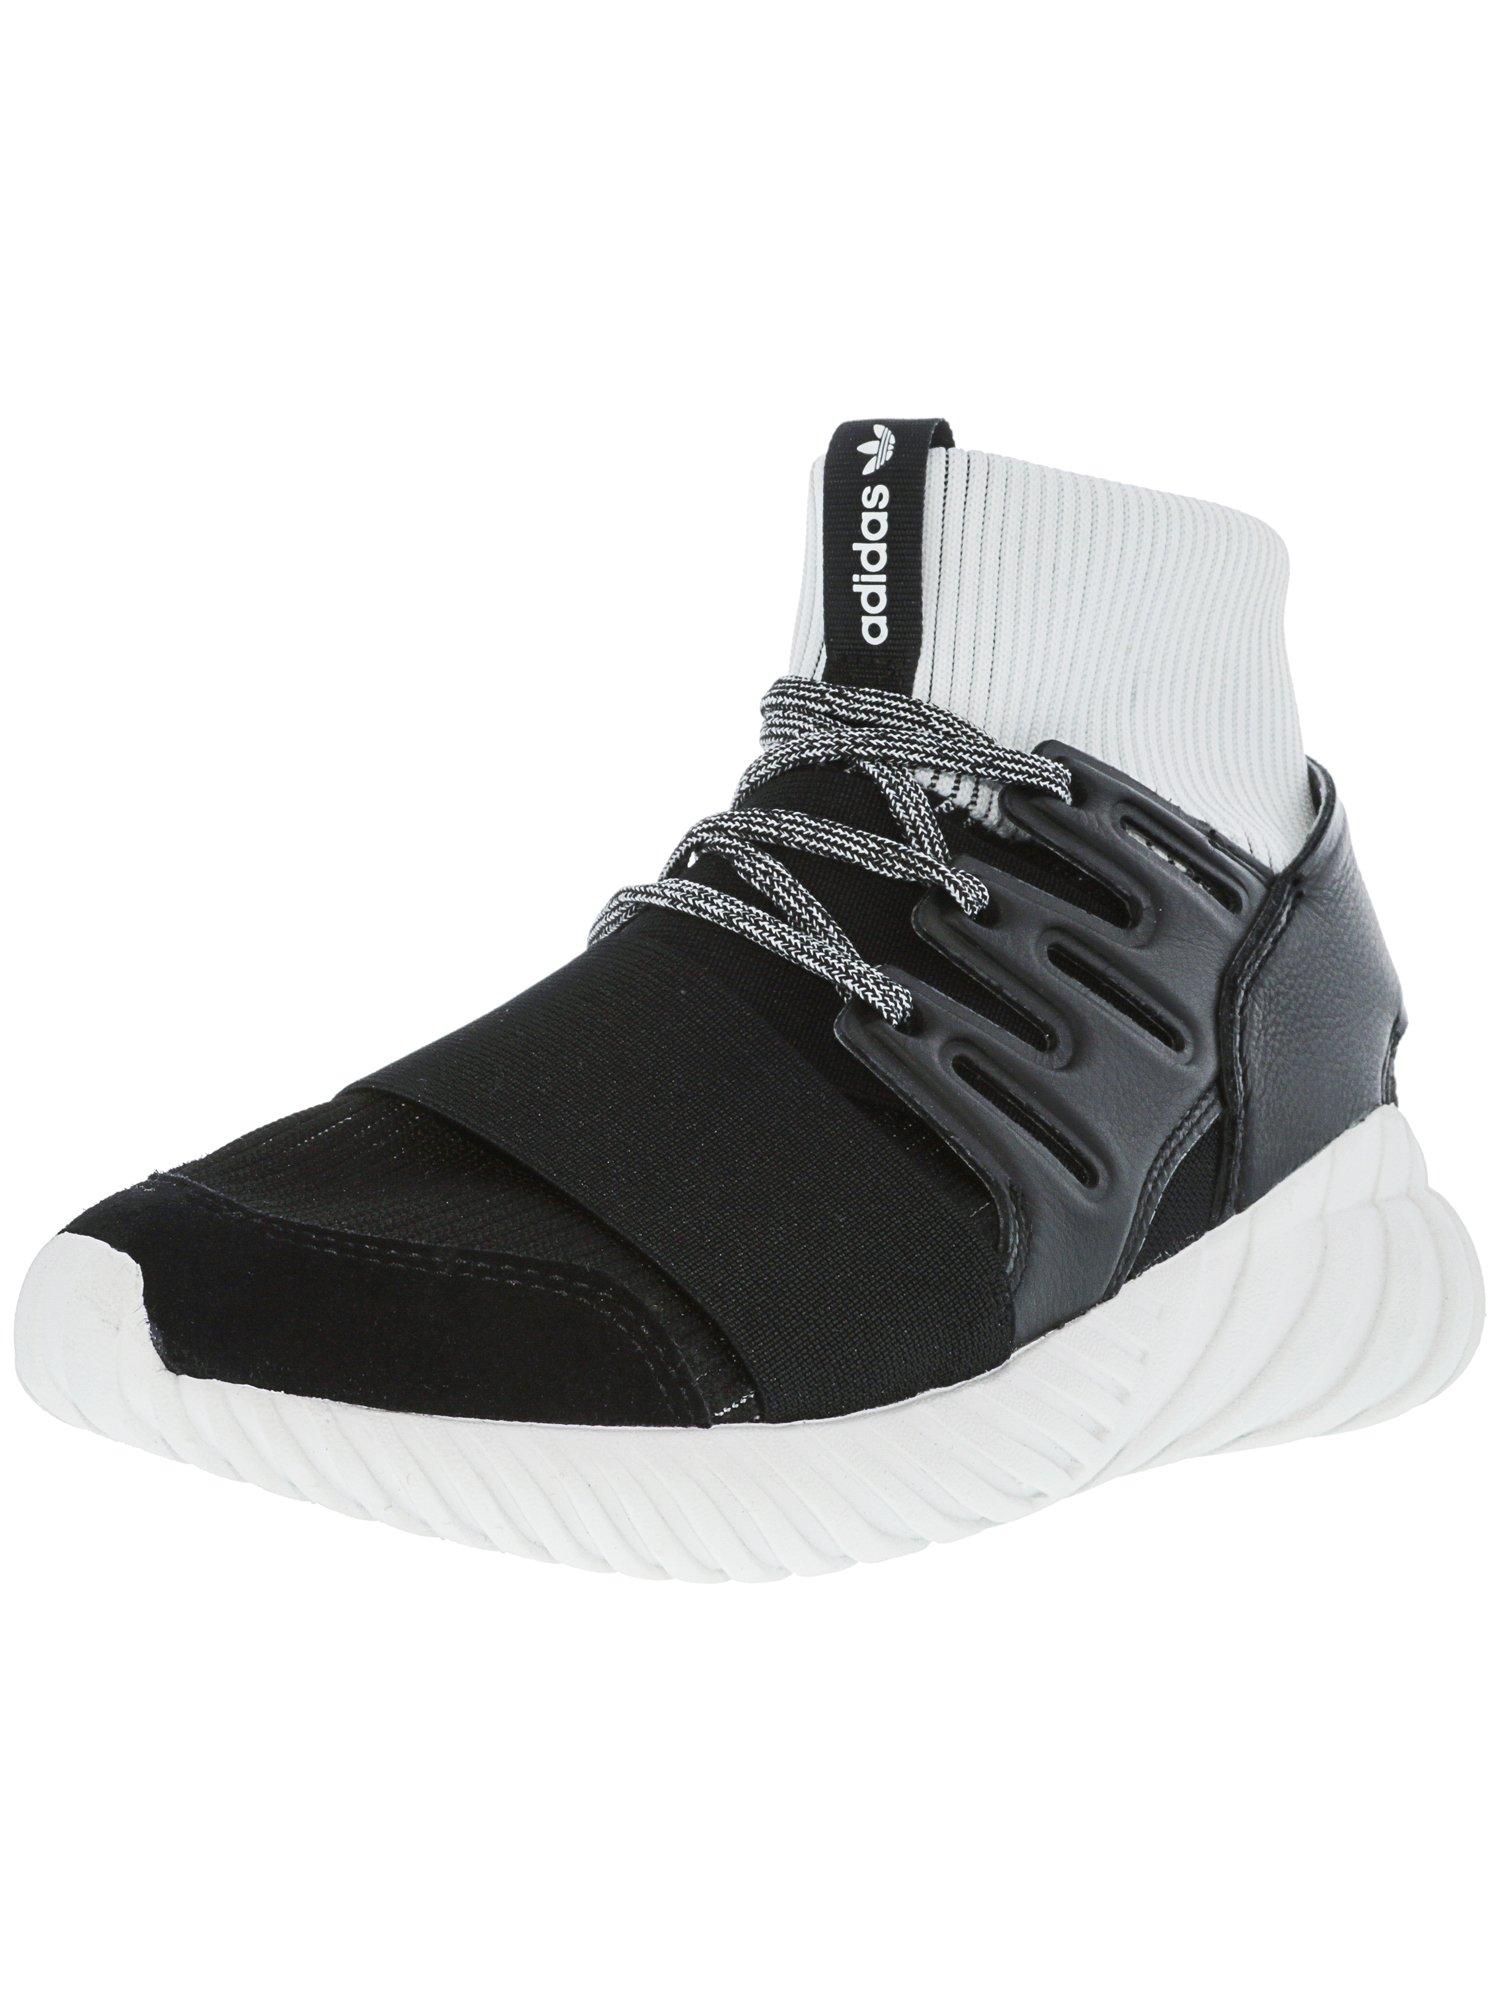 low cost cace1 e90f5 Adidas Men's Tubular Doom High-Top Sneaker